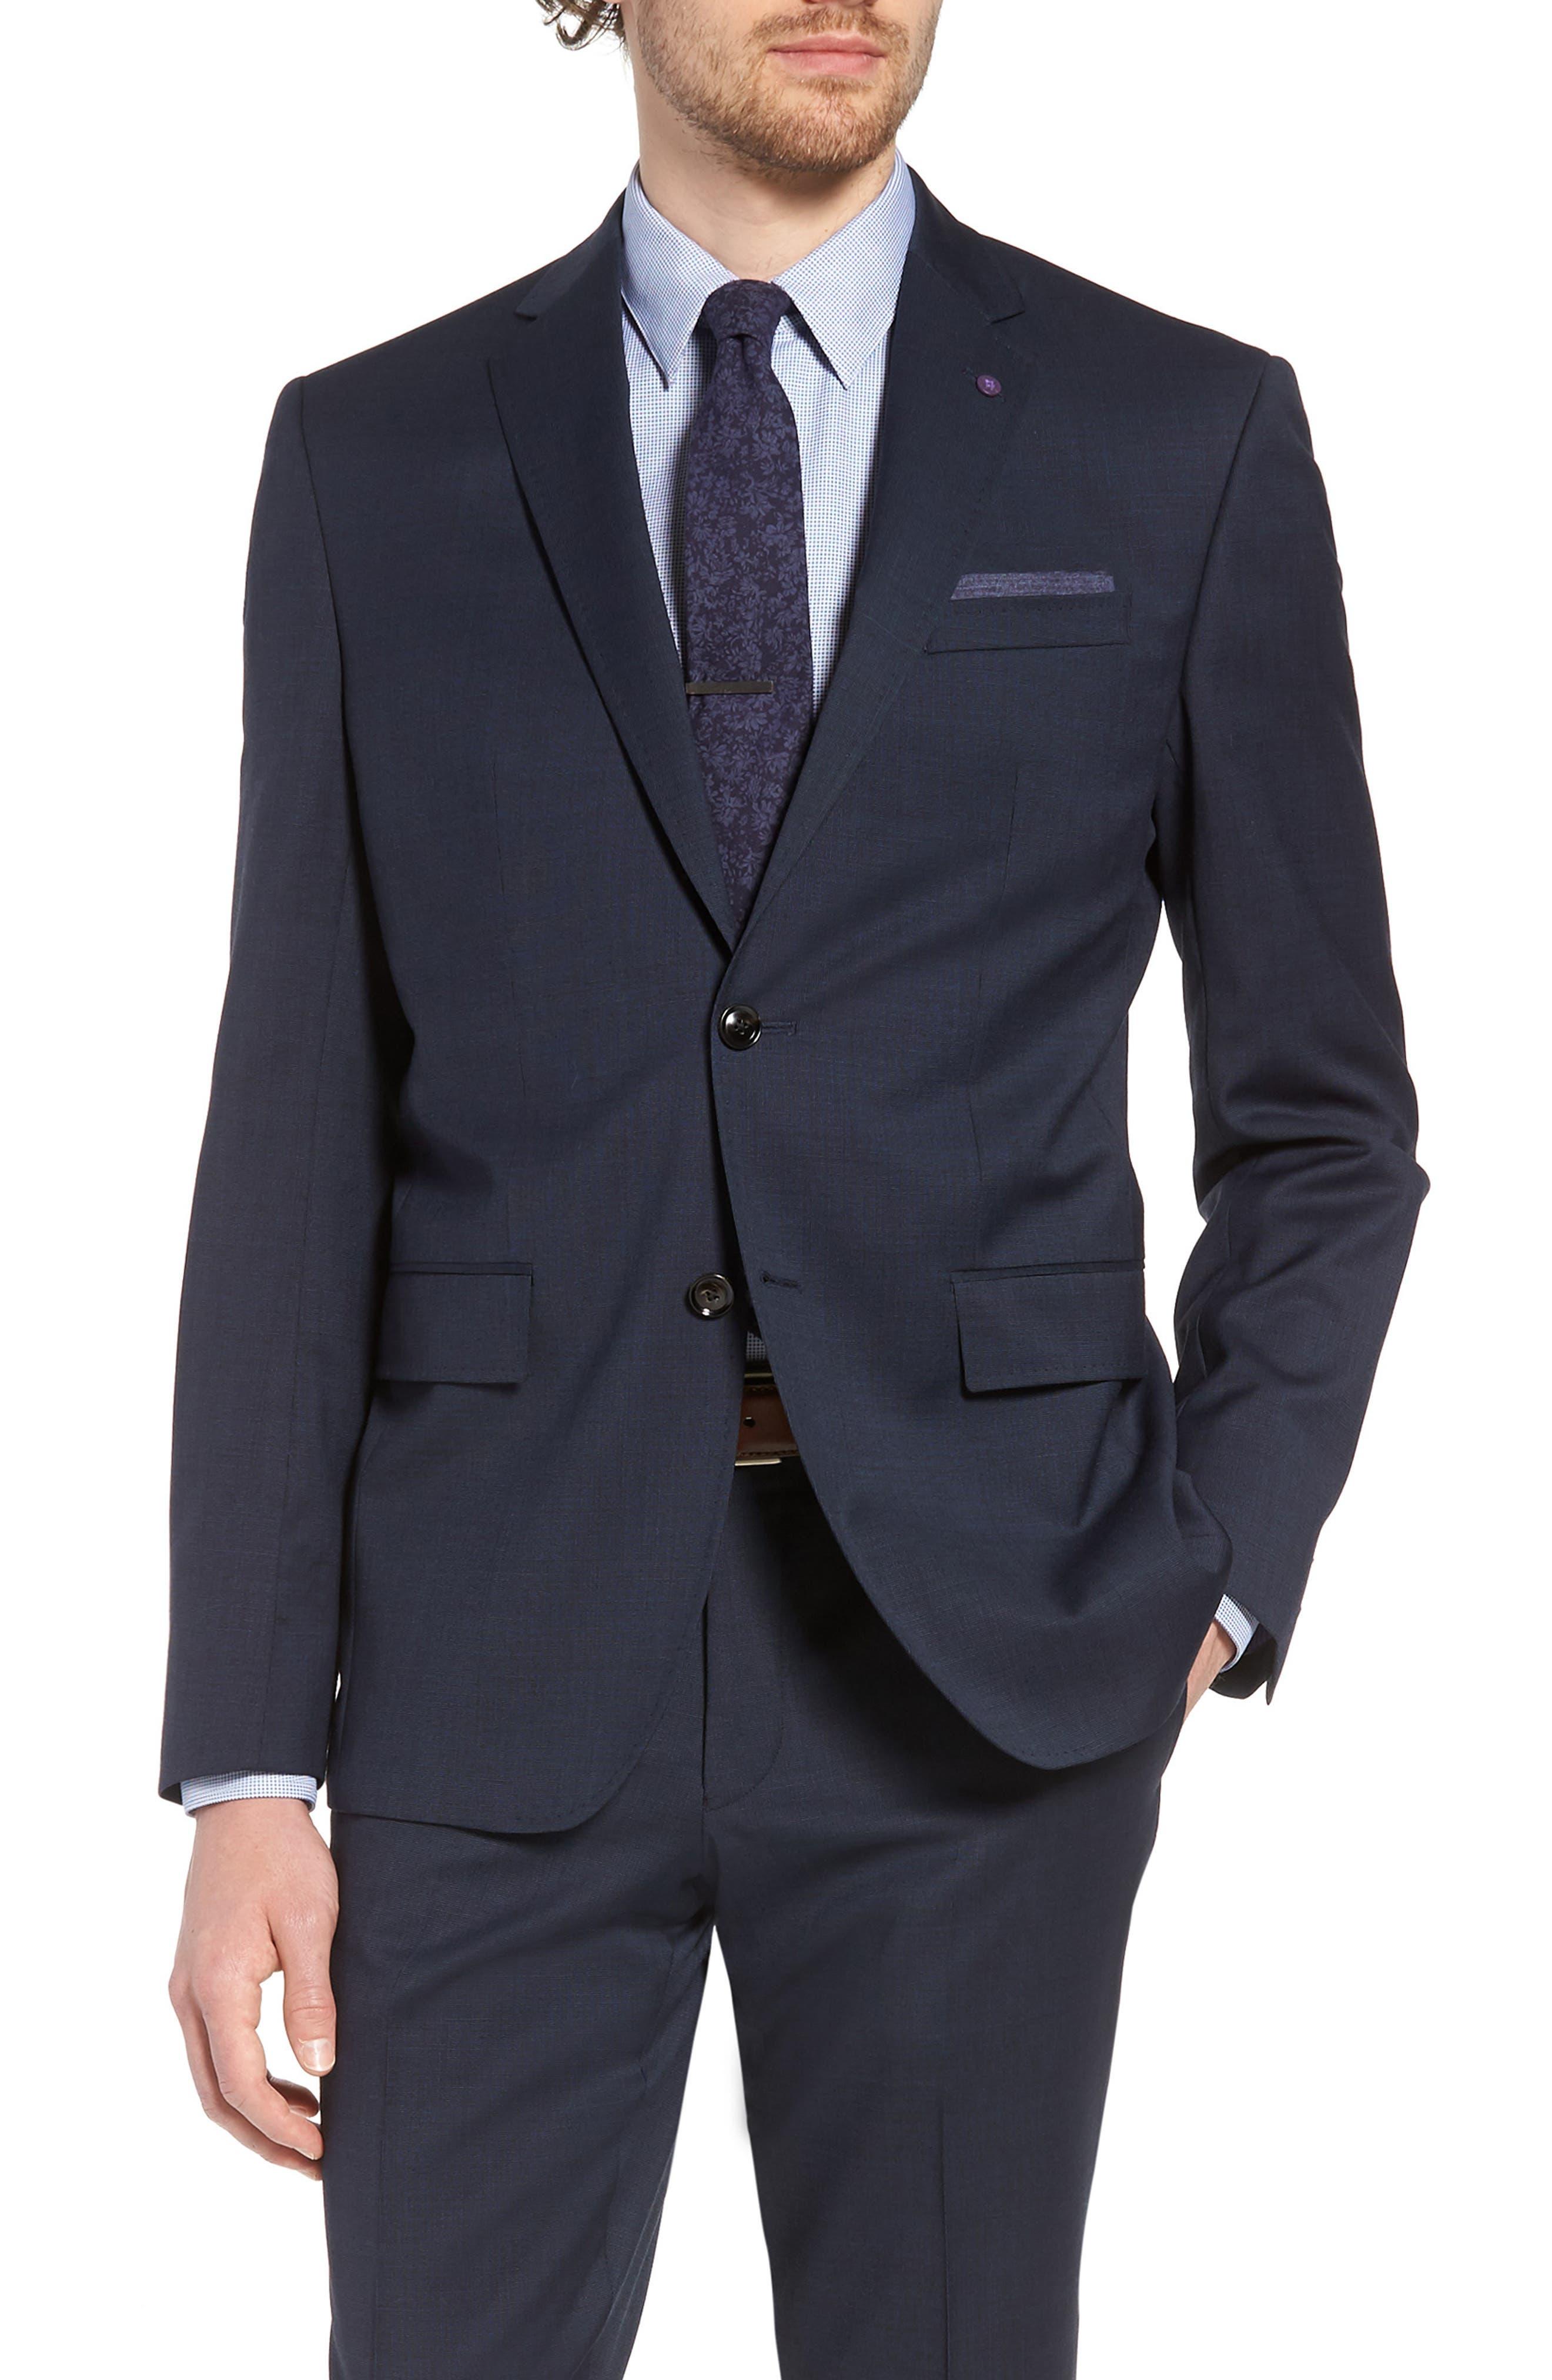 Jay Trim Fit Solid Wool Suit,                             Alternate thumbnail 5, color,